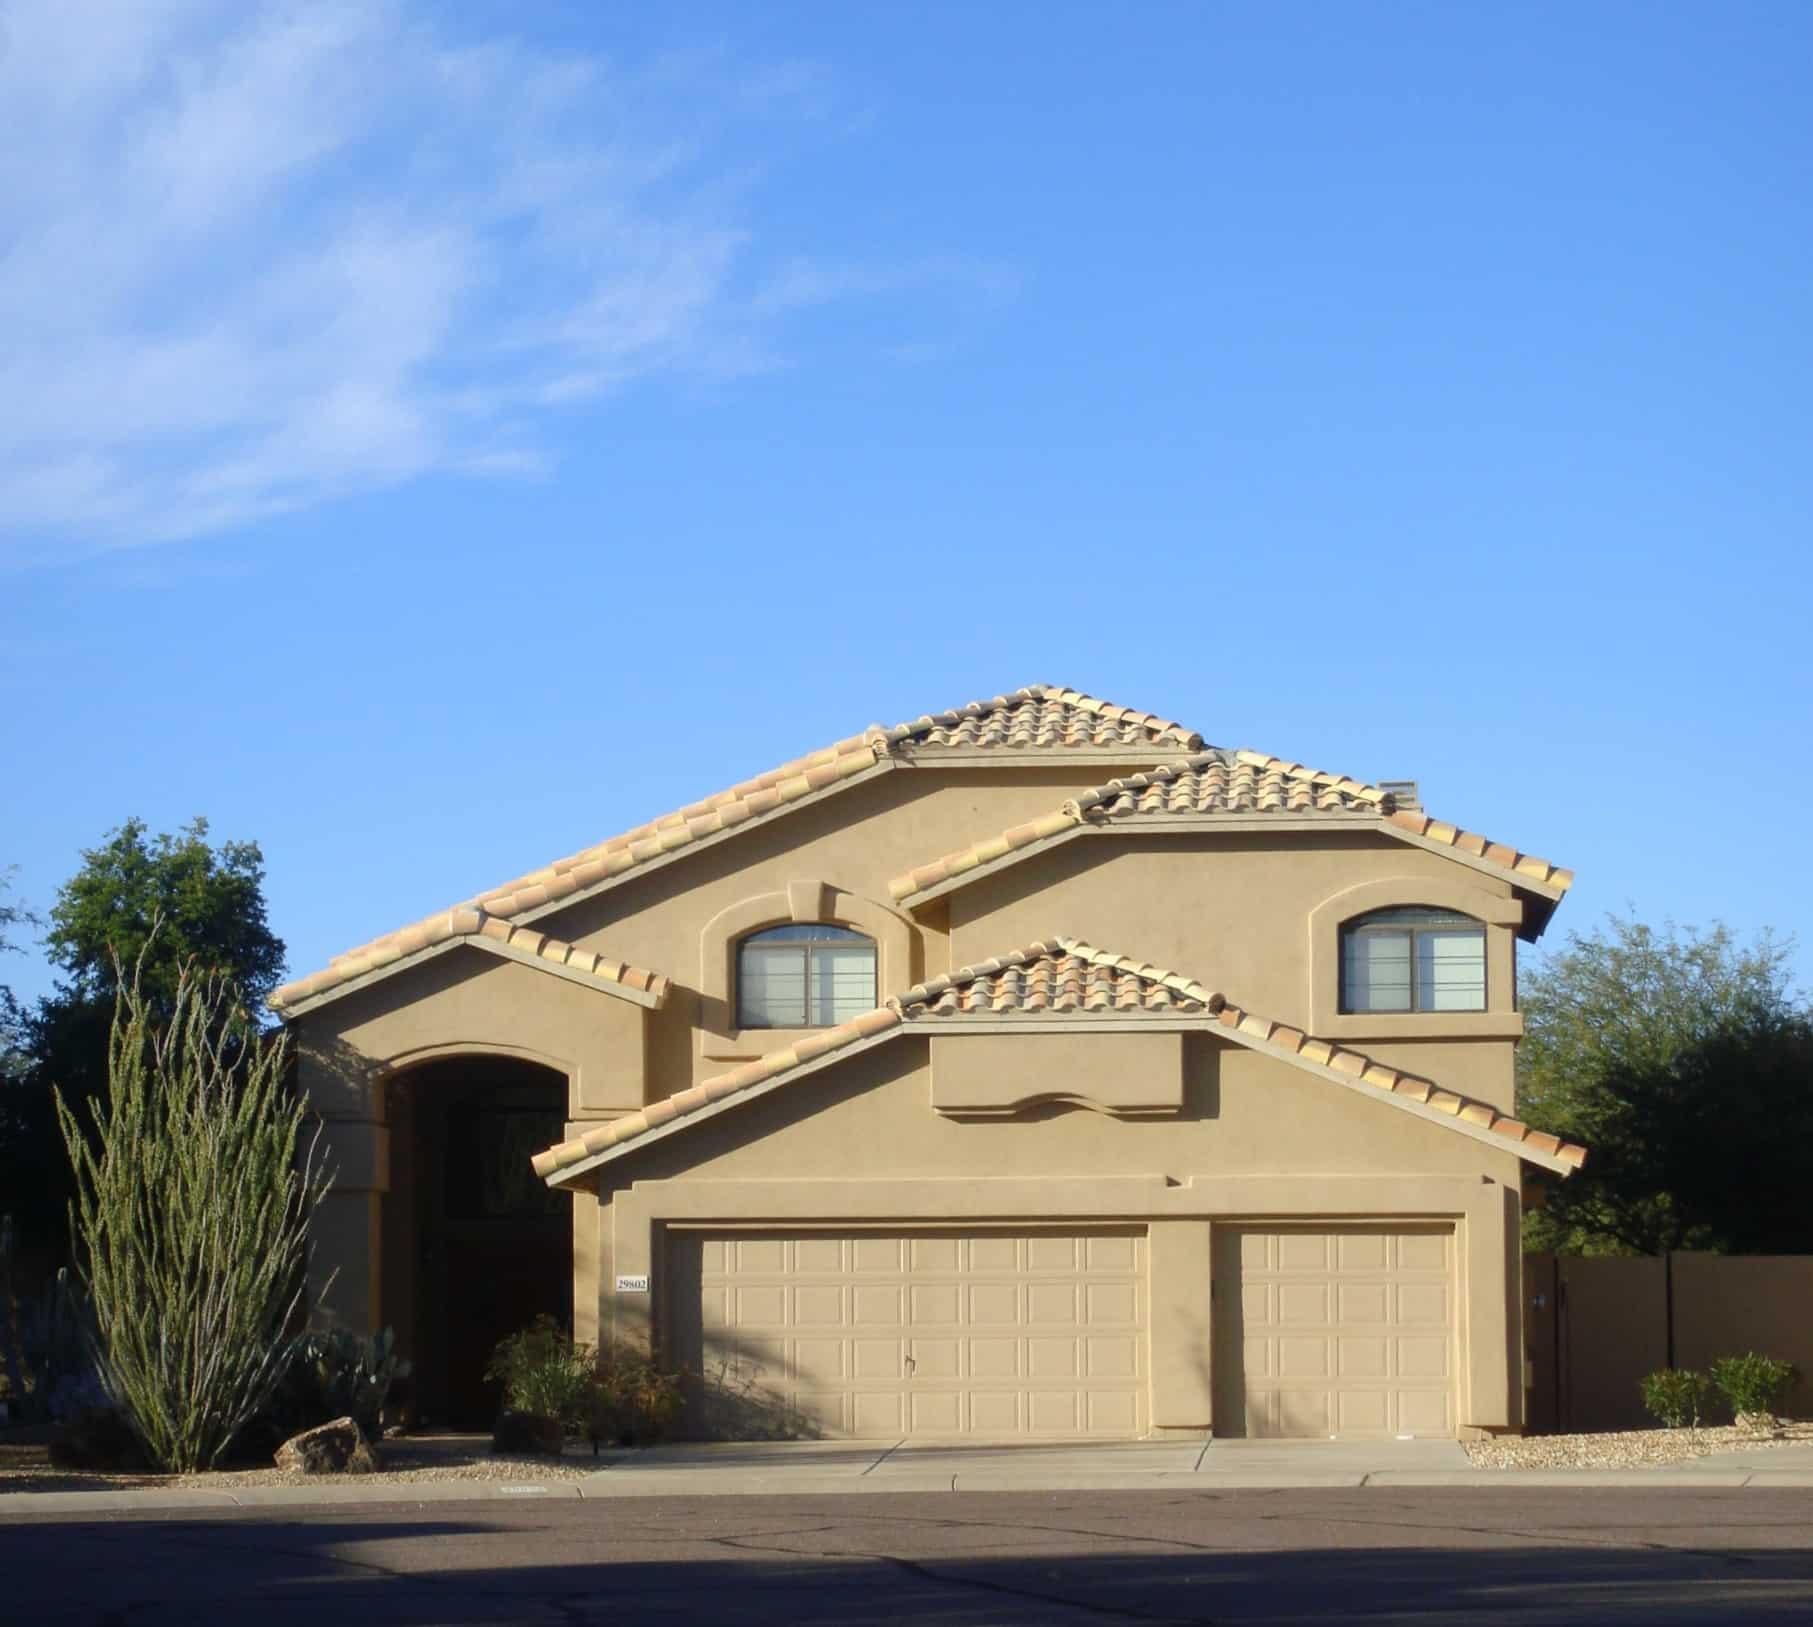 Tatum Ranch Cave Creek Real Estate - Scottsdale AZ Real Estate ...